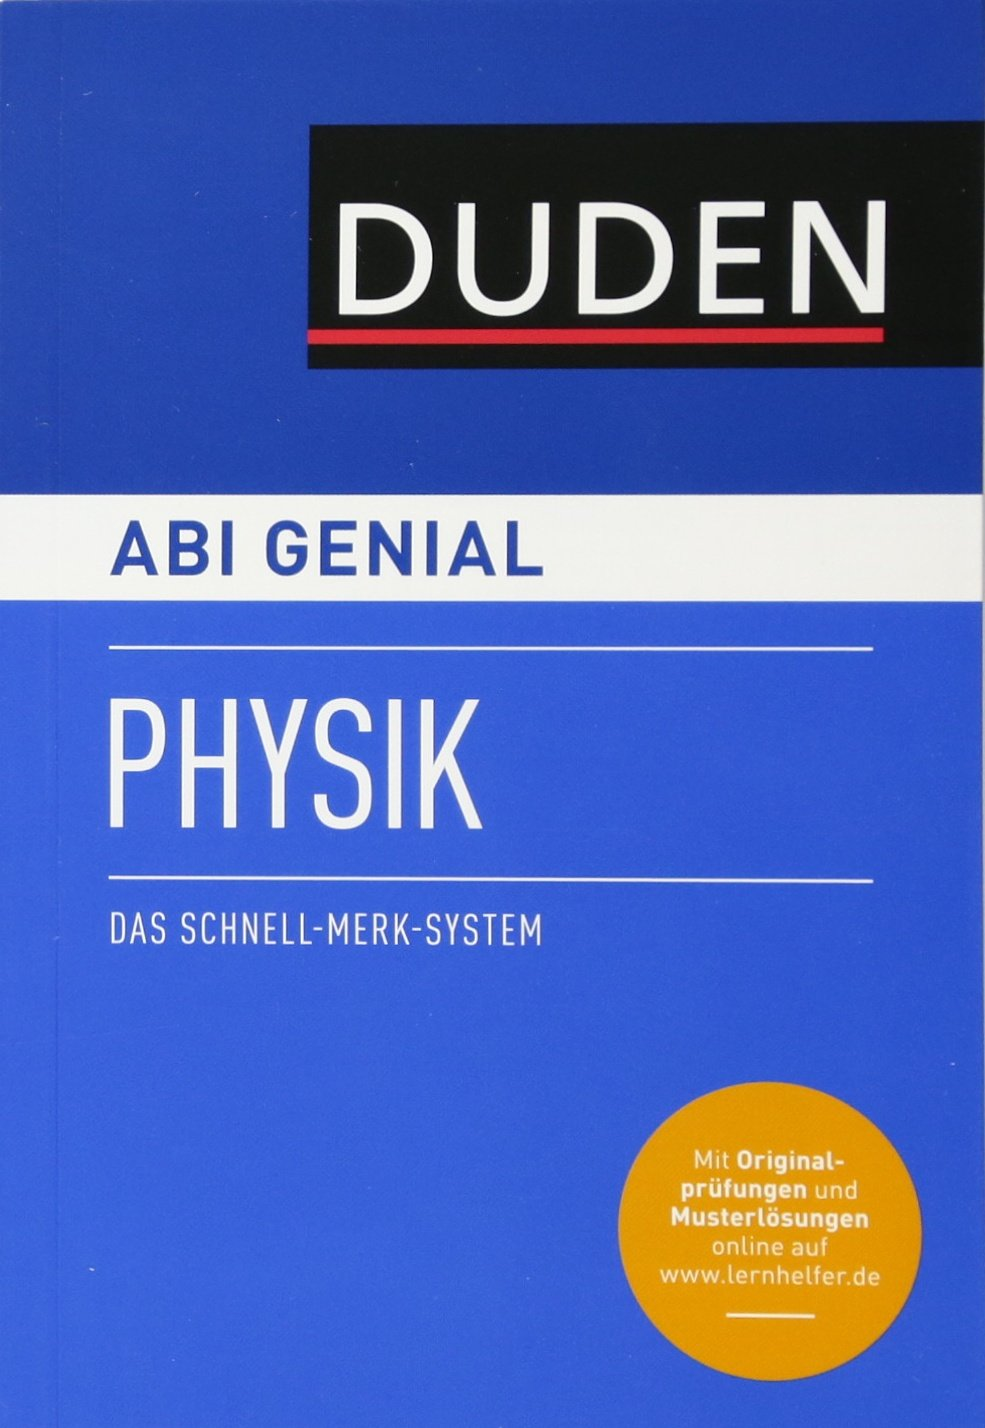 Abi genial Physik: Das Schnell-Merk-System (Duden SMS - Schnell-Merk-System)